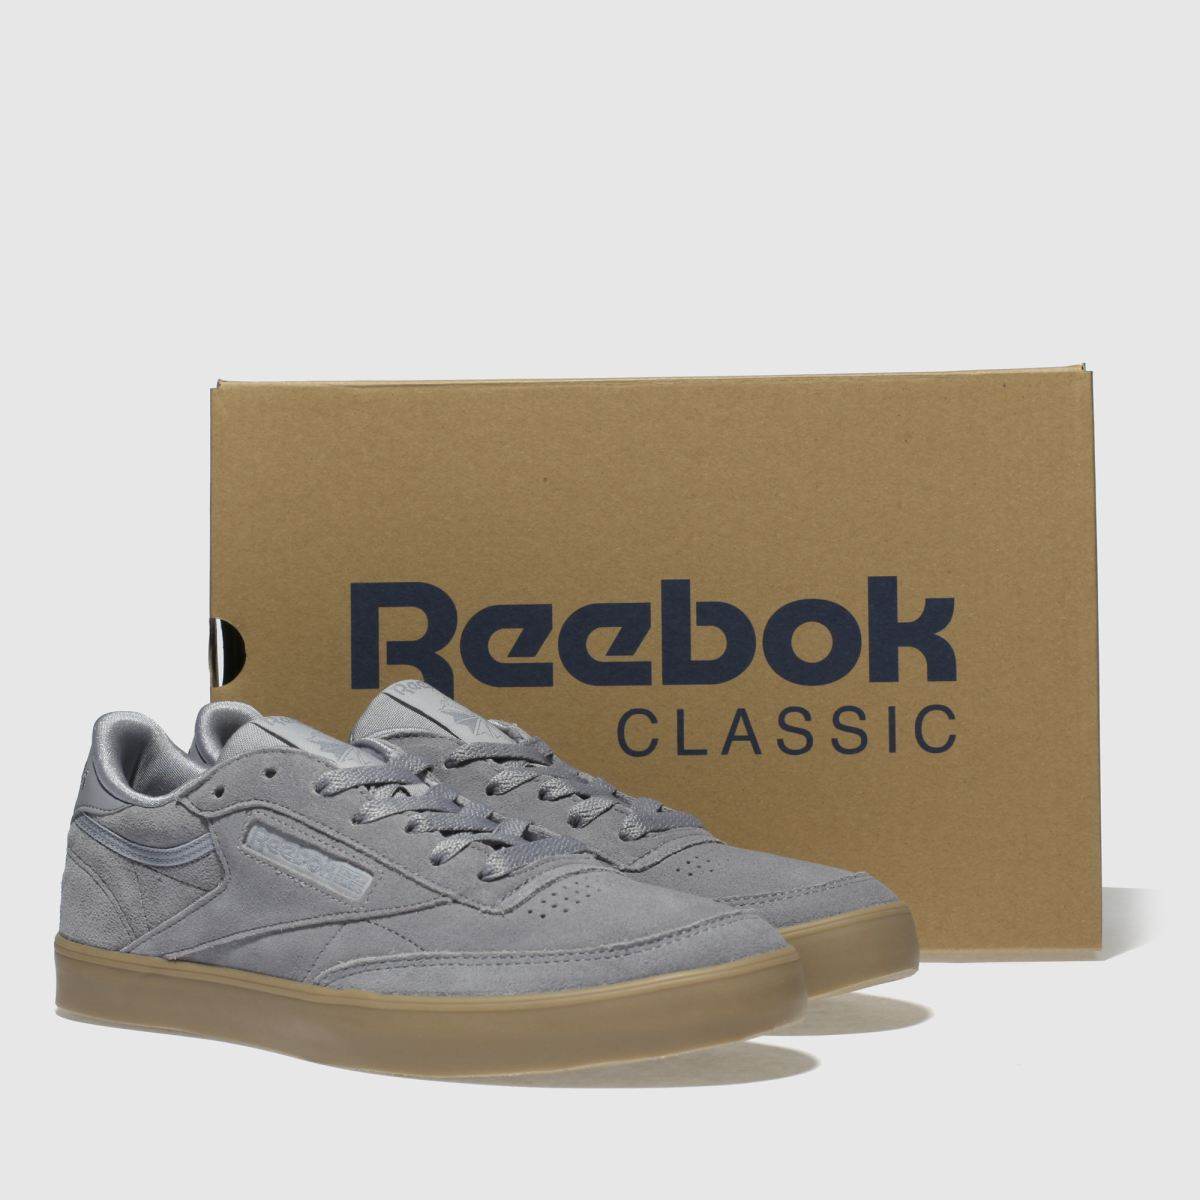 Damen Hellblau Fvs reebok Club C 85 Fvs Hellblau Gum Sneaker   schuh Gute Qualität beliebte Schuhe cdfde6